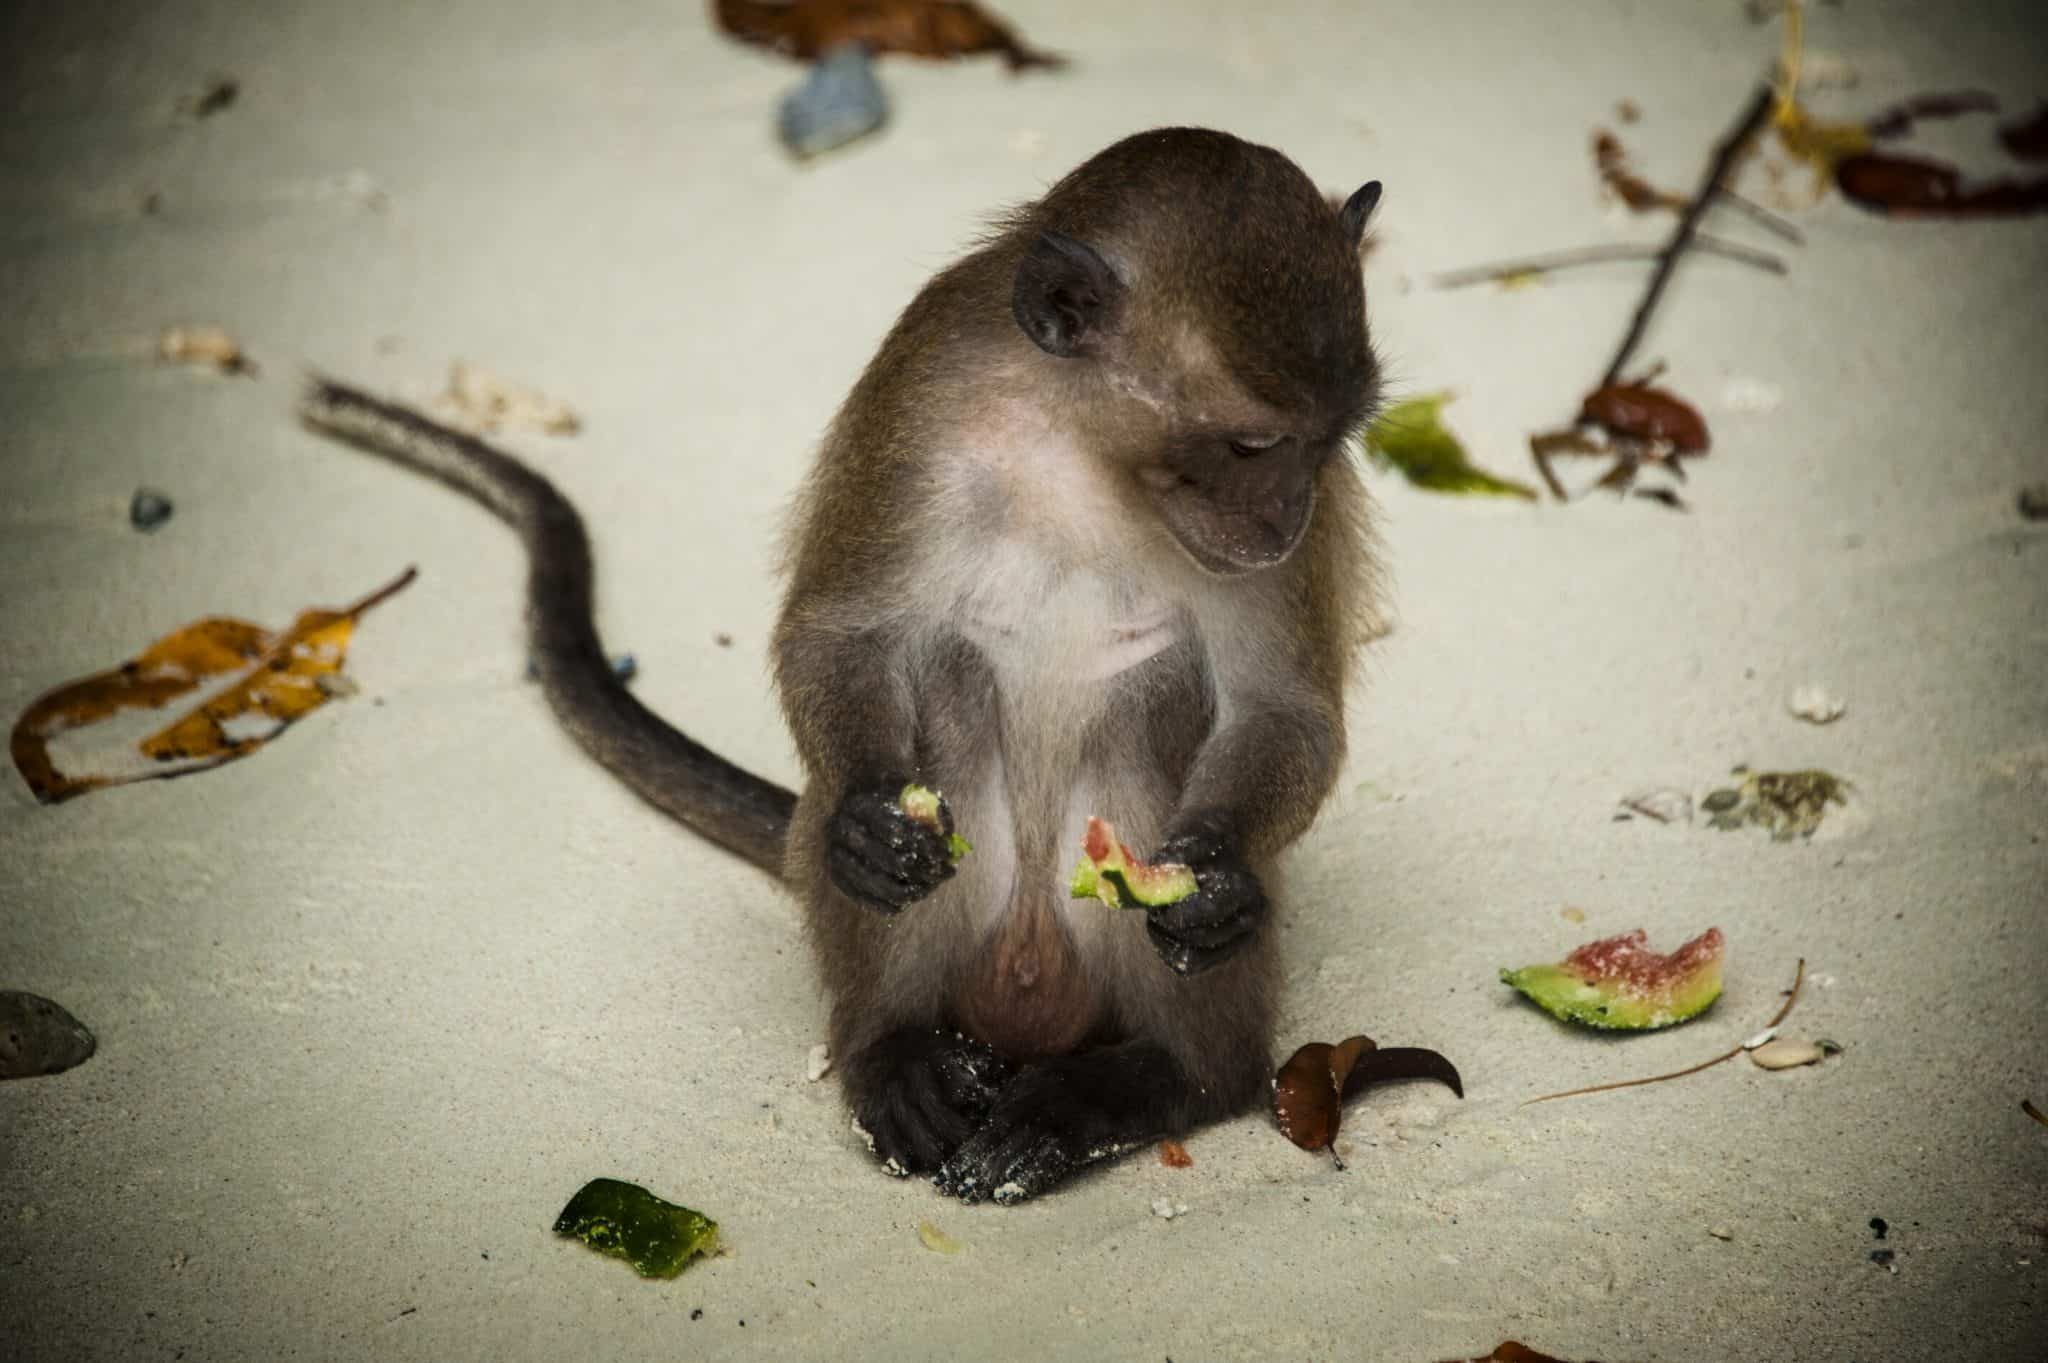 Monkey Beach - O macaco que me tentou assaltar